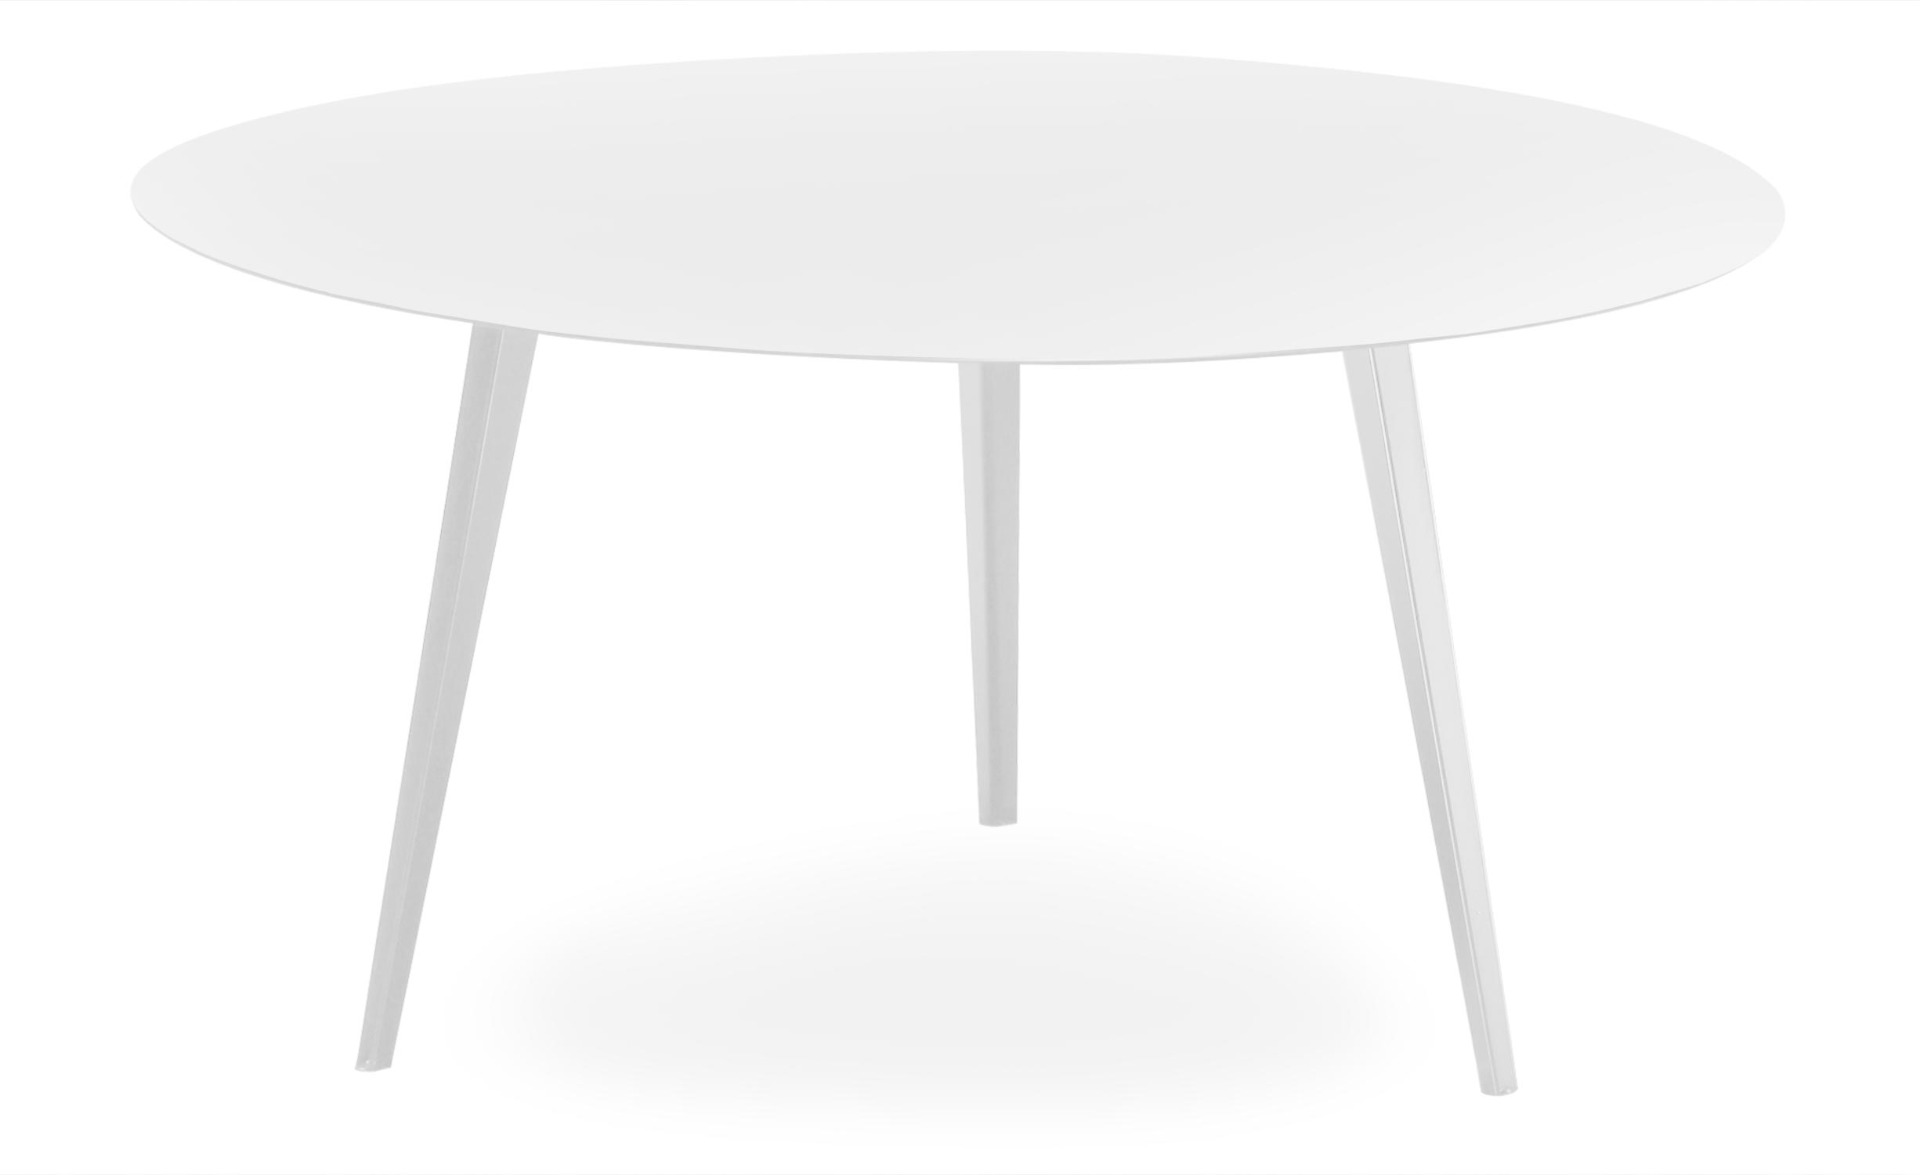 Blickfang Runder, magnetischer Couchtisch aus Metall 90 cm Weiß